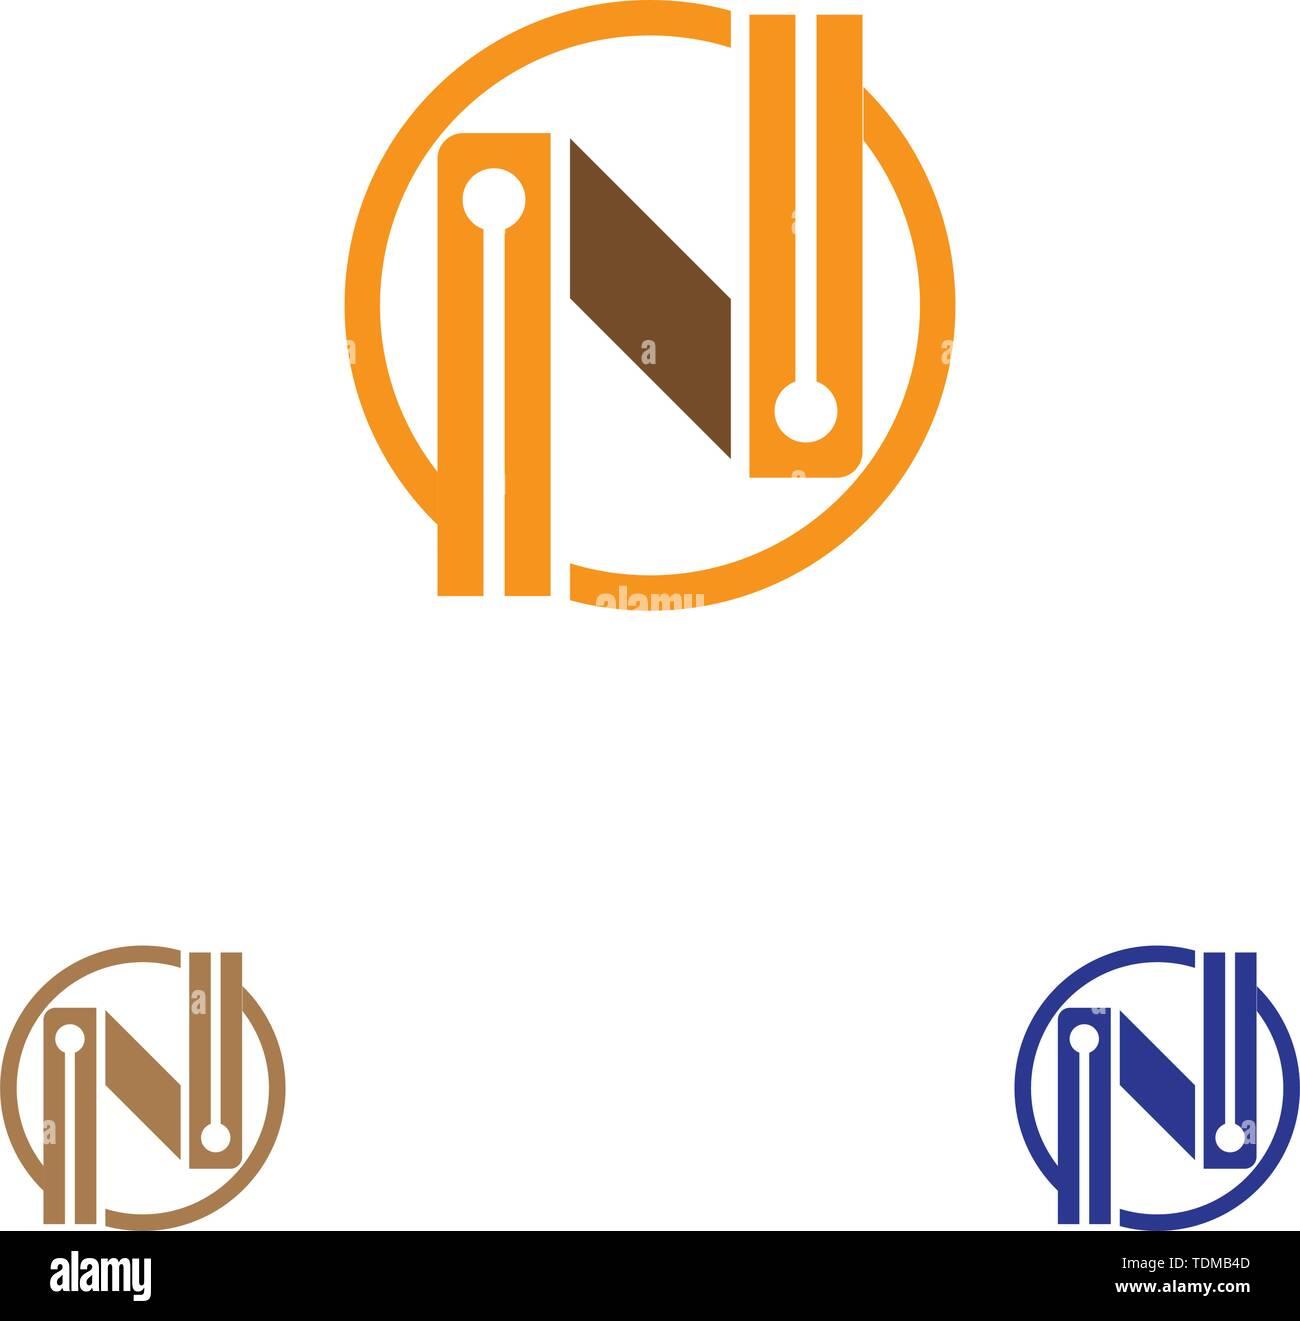 N Letter Logo Template vector icon illustration design - Stock Image